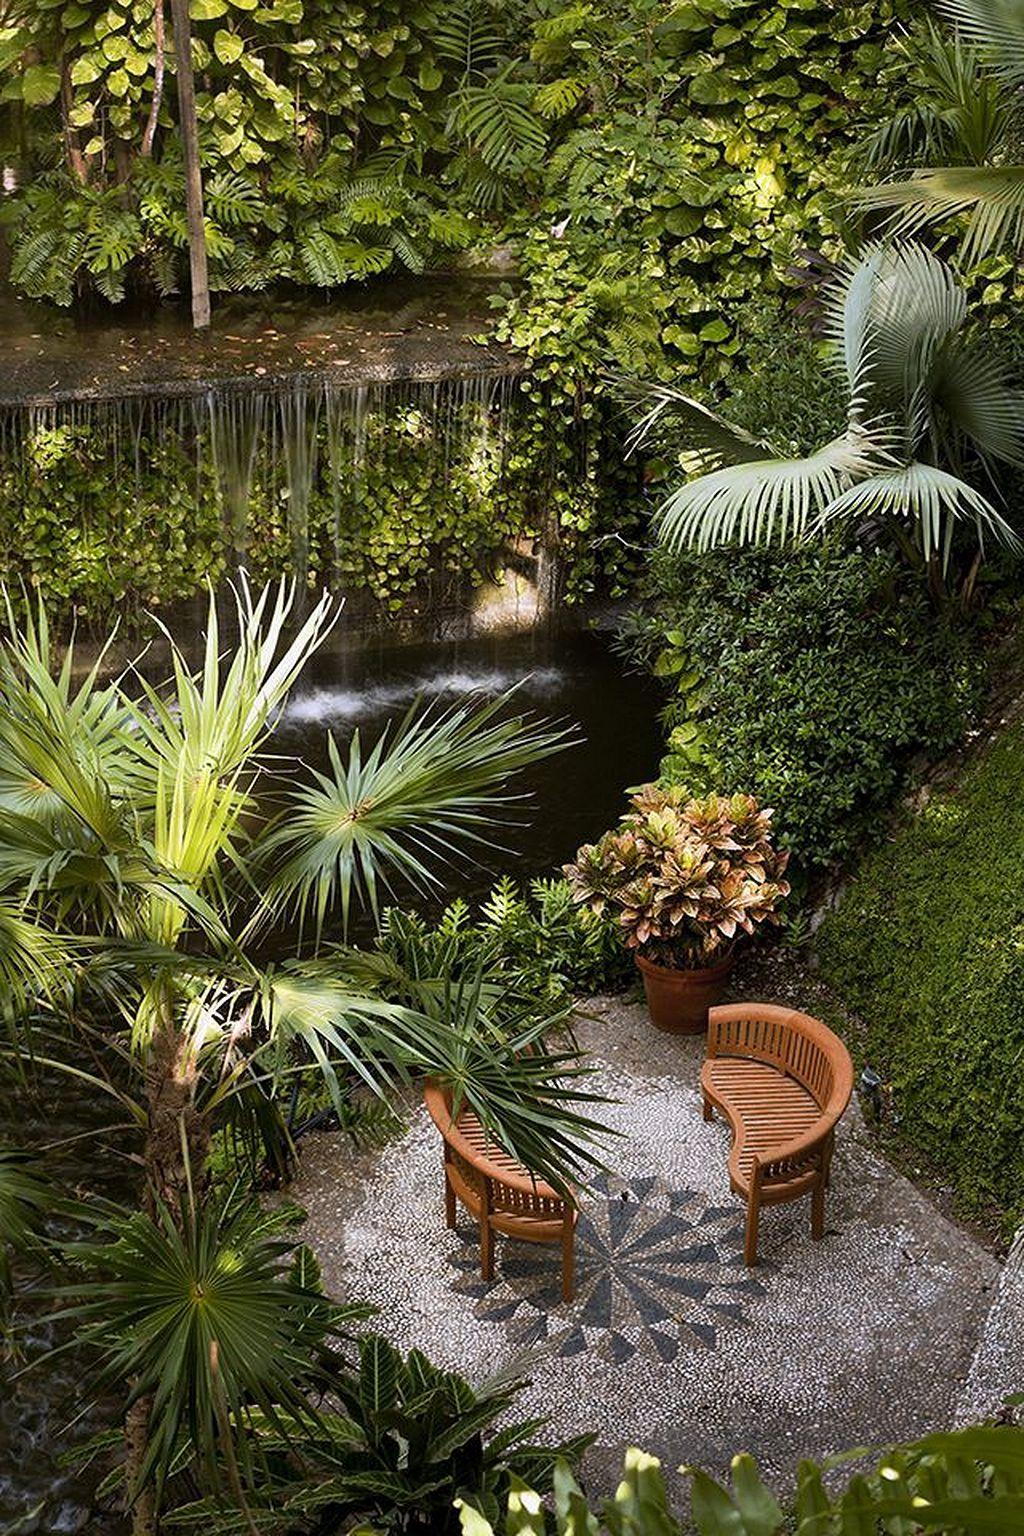 60 warm tropical backyard landscaping ideas tropical on gorgeous small backyard landscaping ideas with patio design ideas id=55613